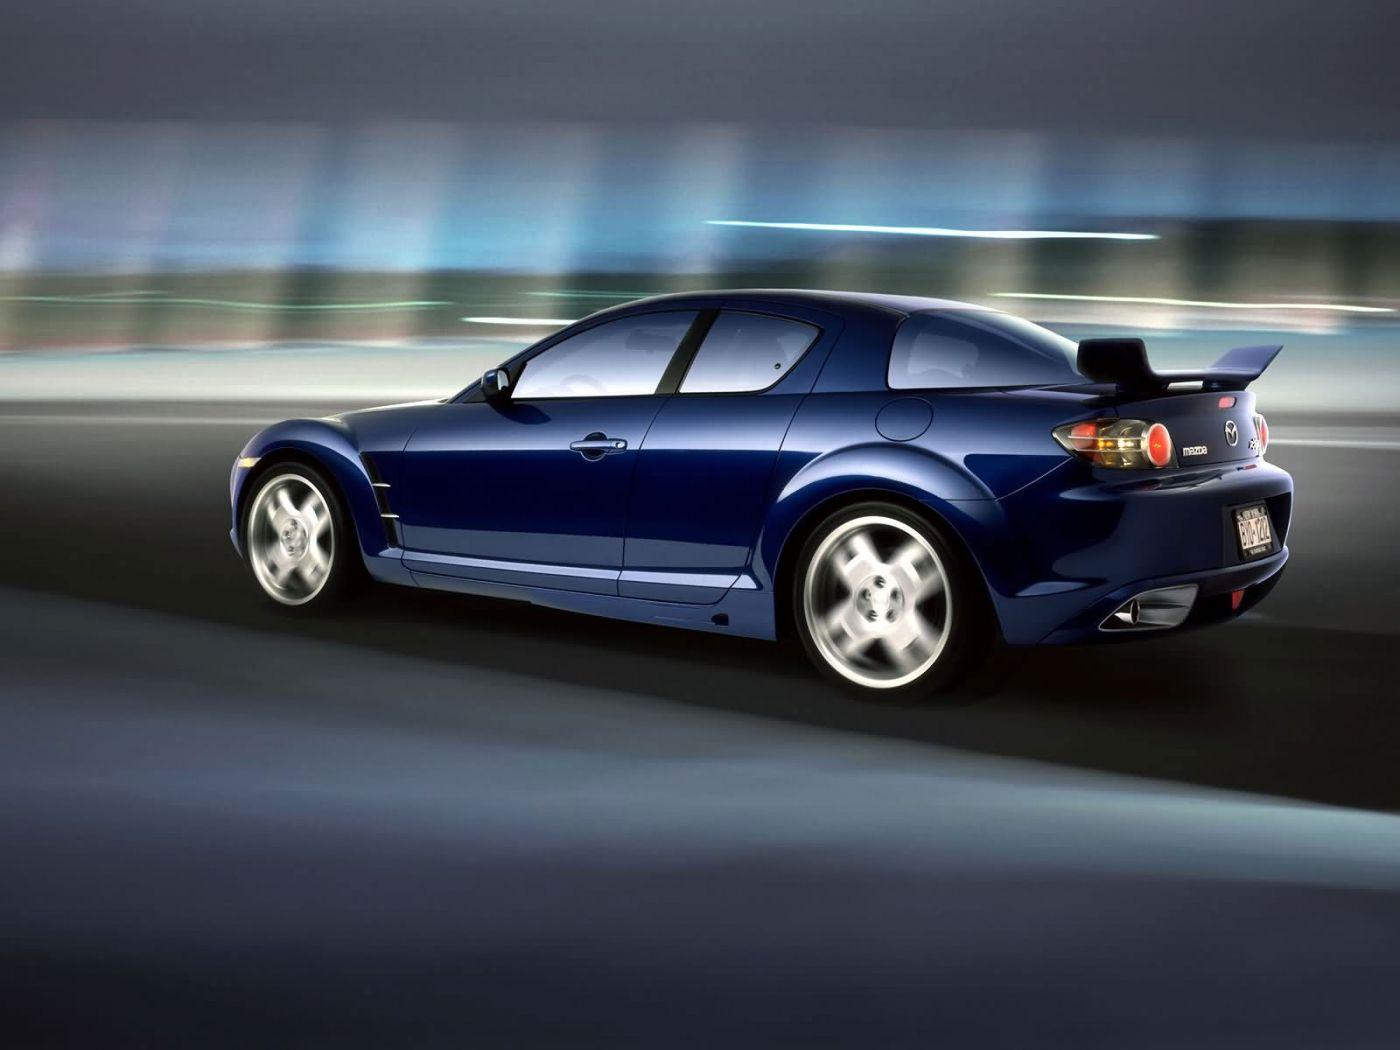 Mazda Rx8 Moving Blurred Background Wallpaper 1400x1050